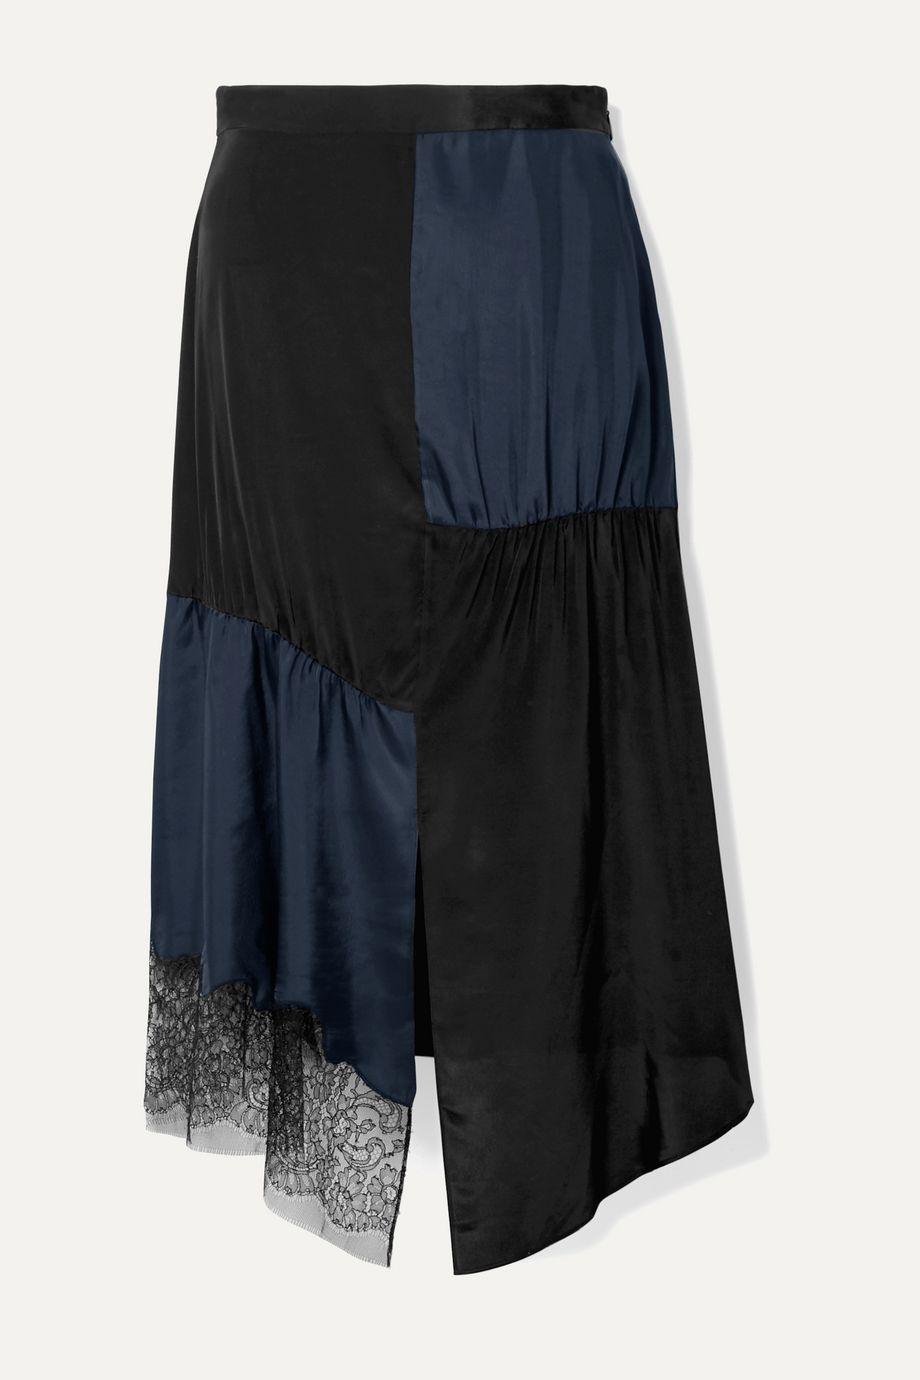 Tibi Paneled lace-trimmed satin-twill and crepe de chine midi skirt